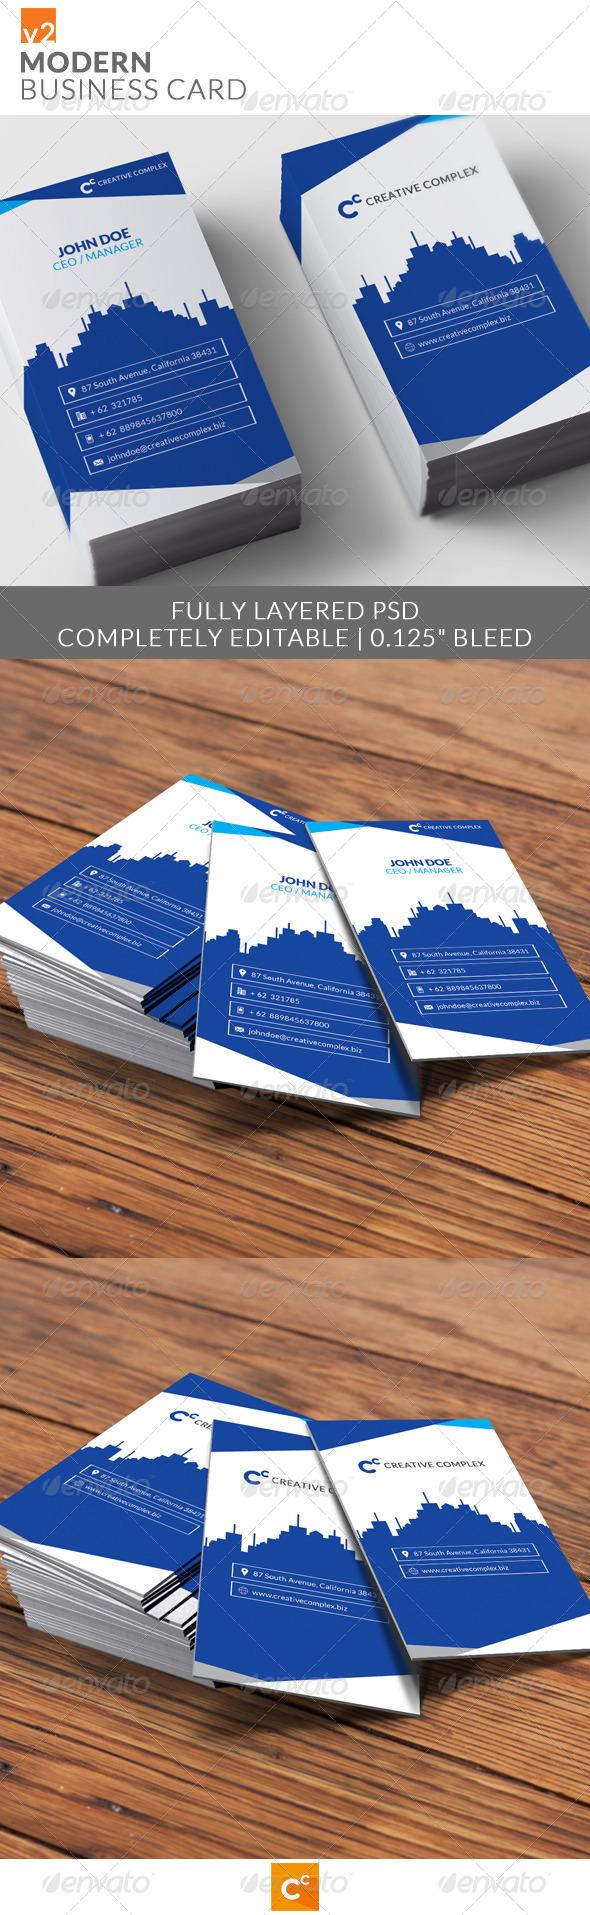 GraphicRiver Modern Business Card v2 8181576